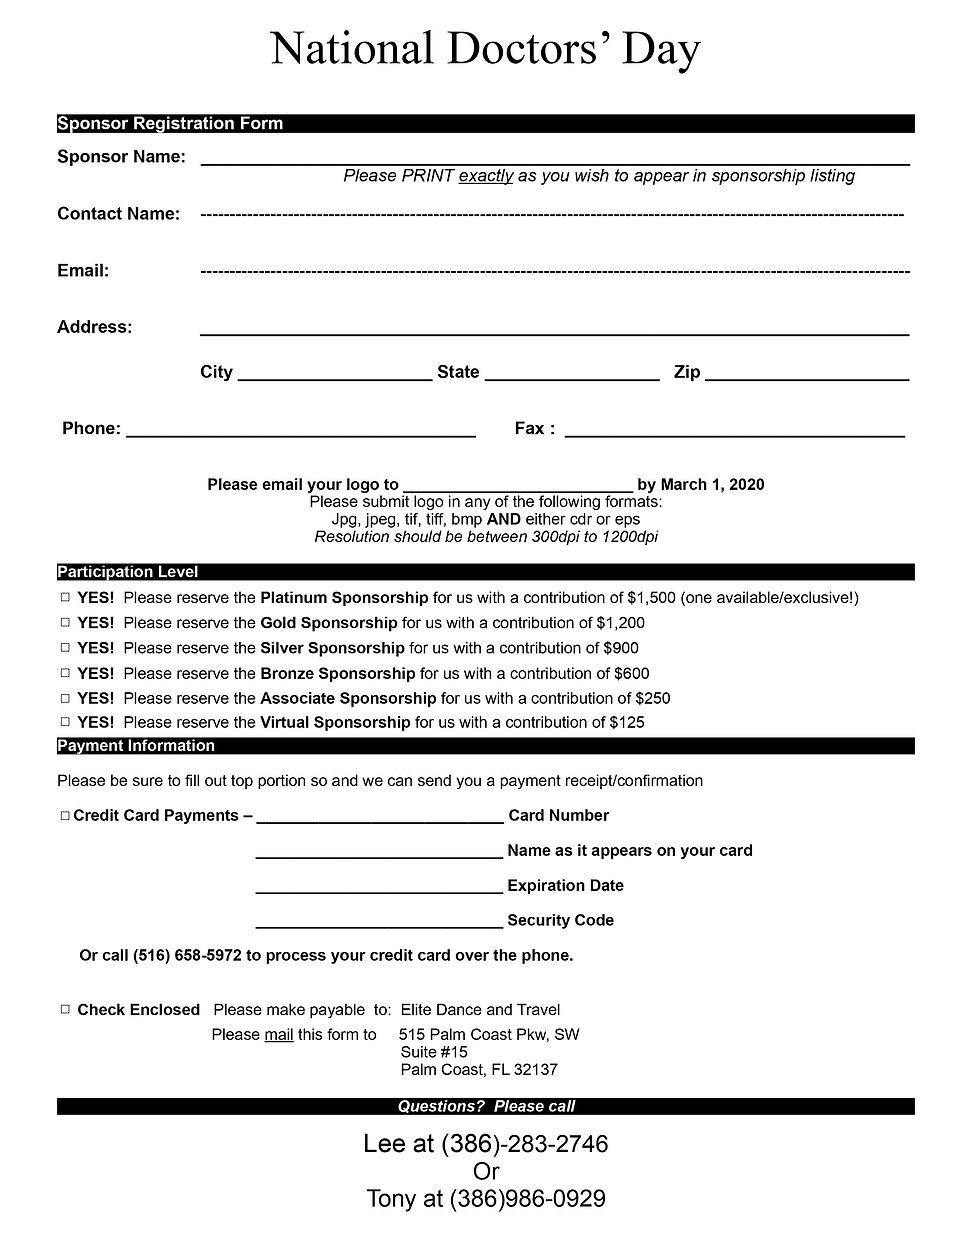 National Doctors' Day Red Carnation Ball Sponsorship Form